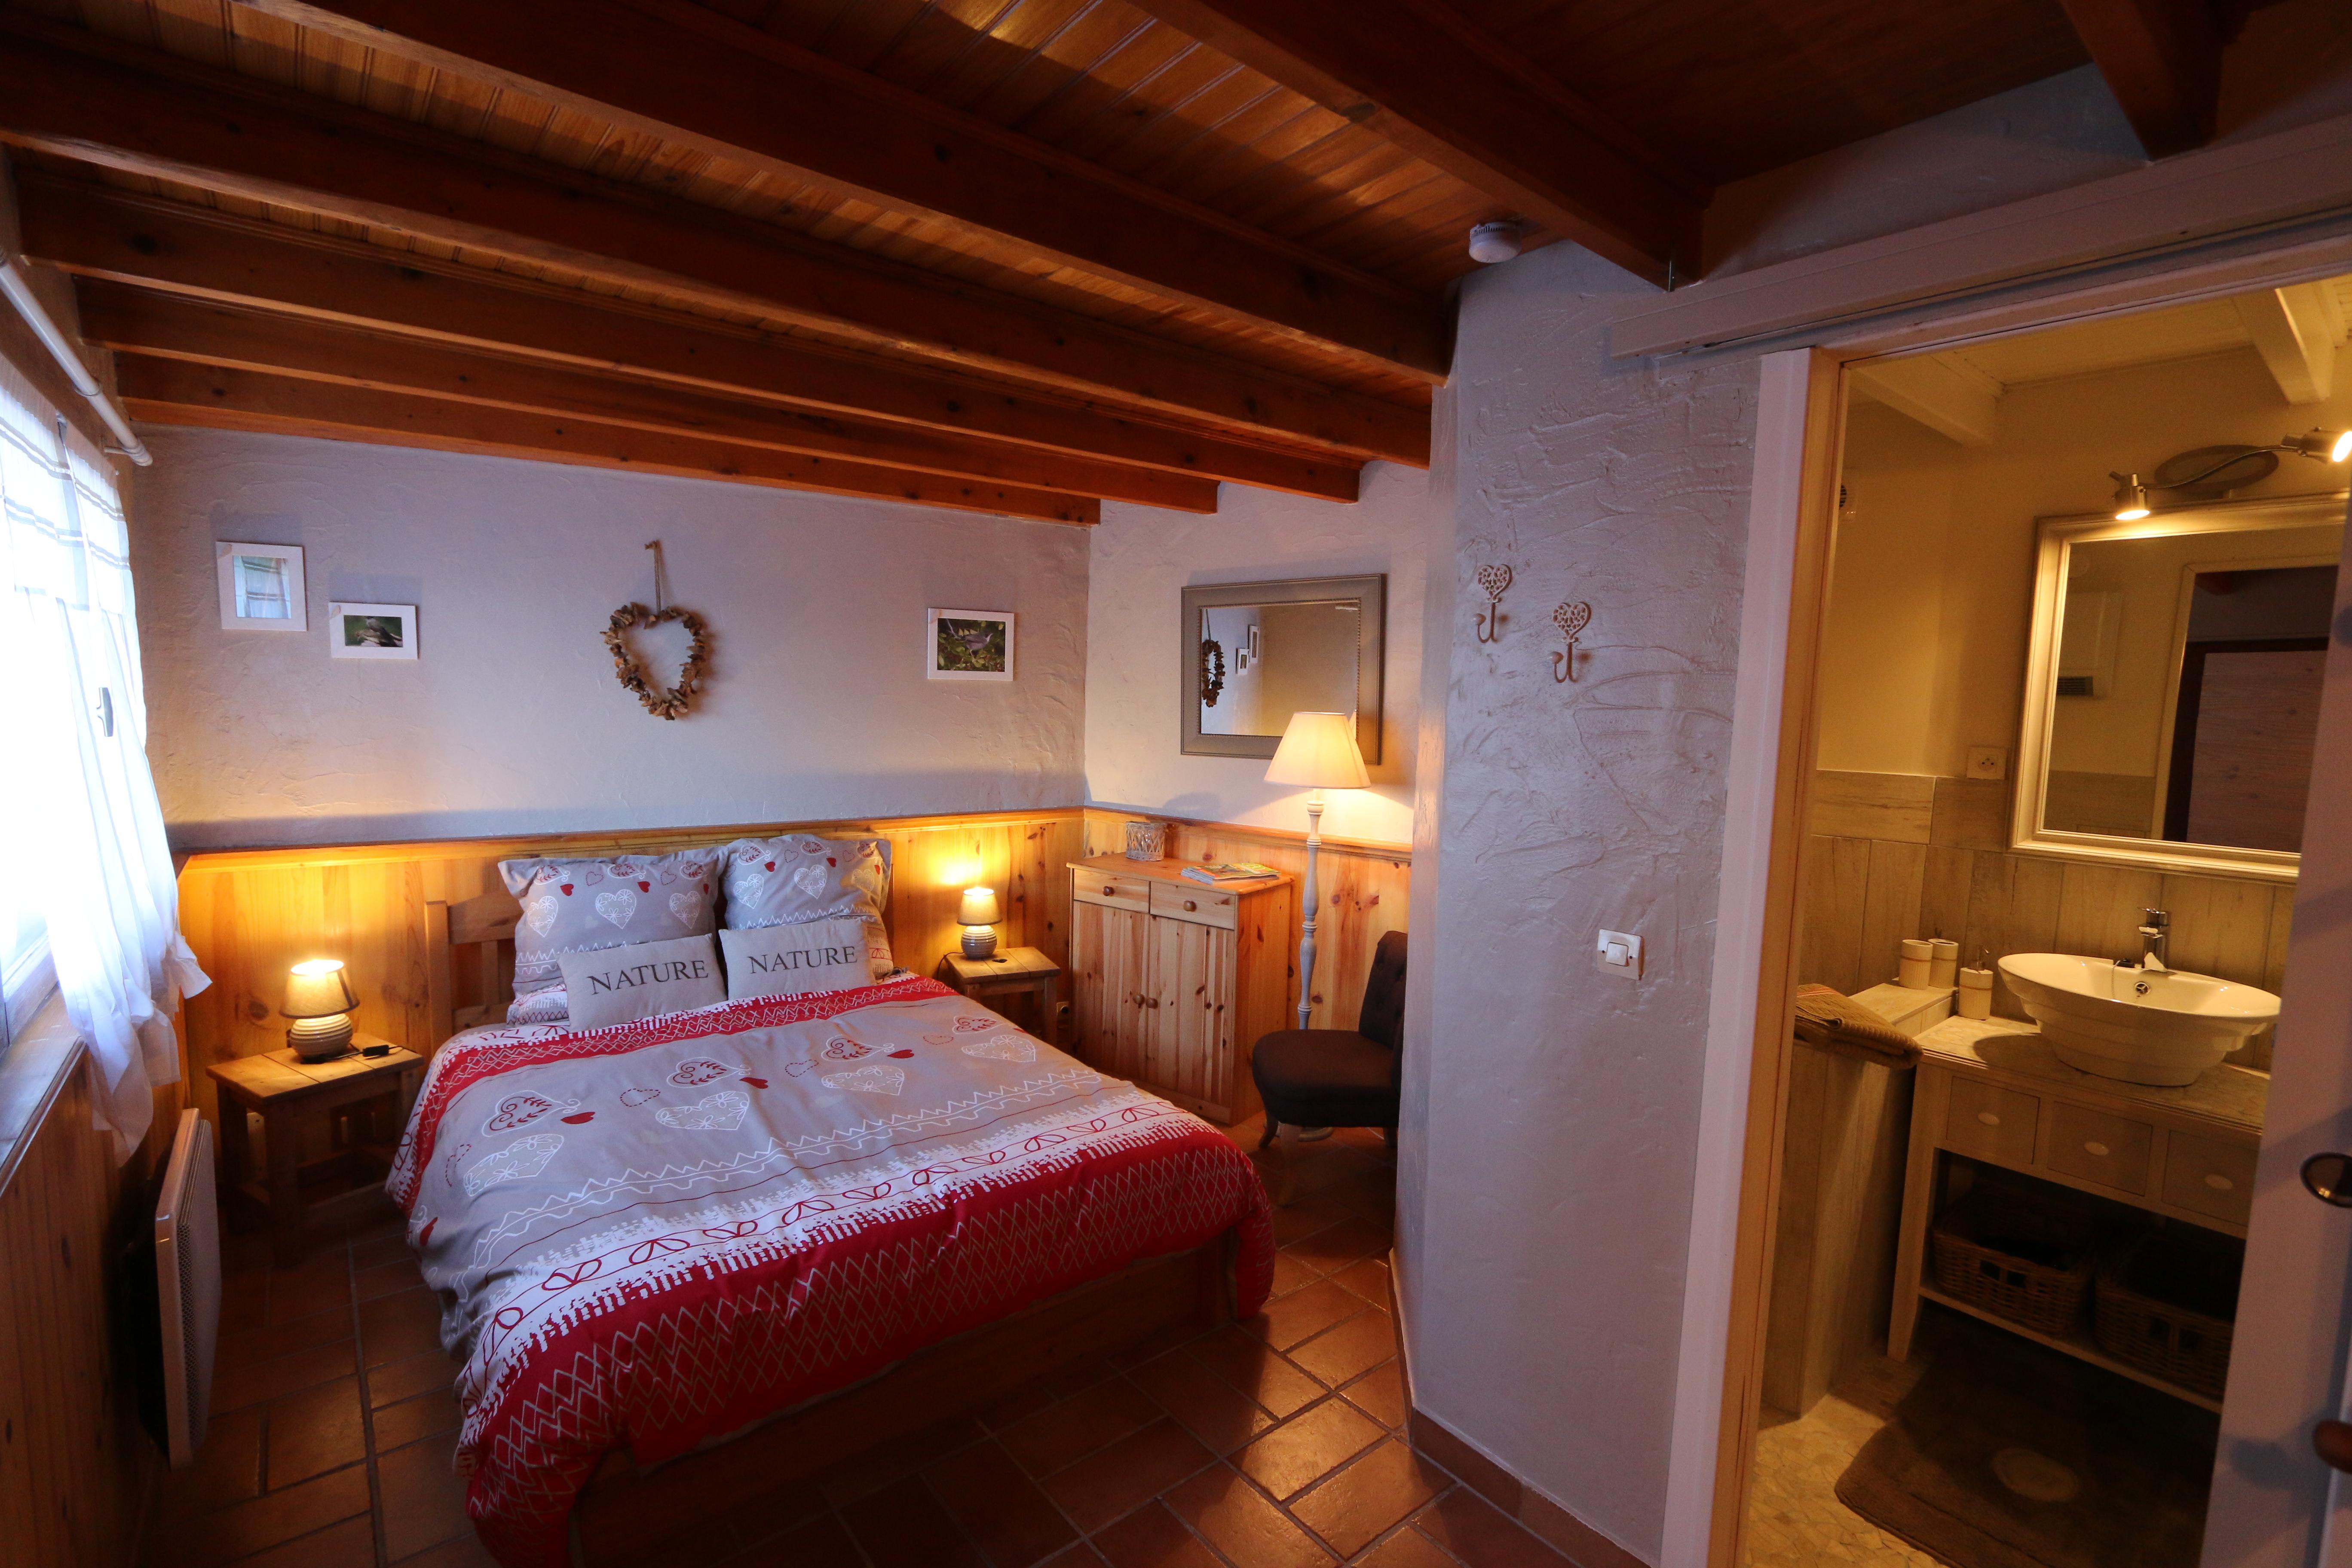 Les vignals une chambre d 39 hotes dans l 39 h rault dans le - Chambres d hotes dans l herault ...